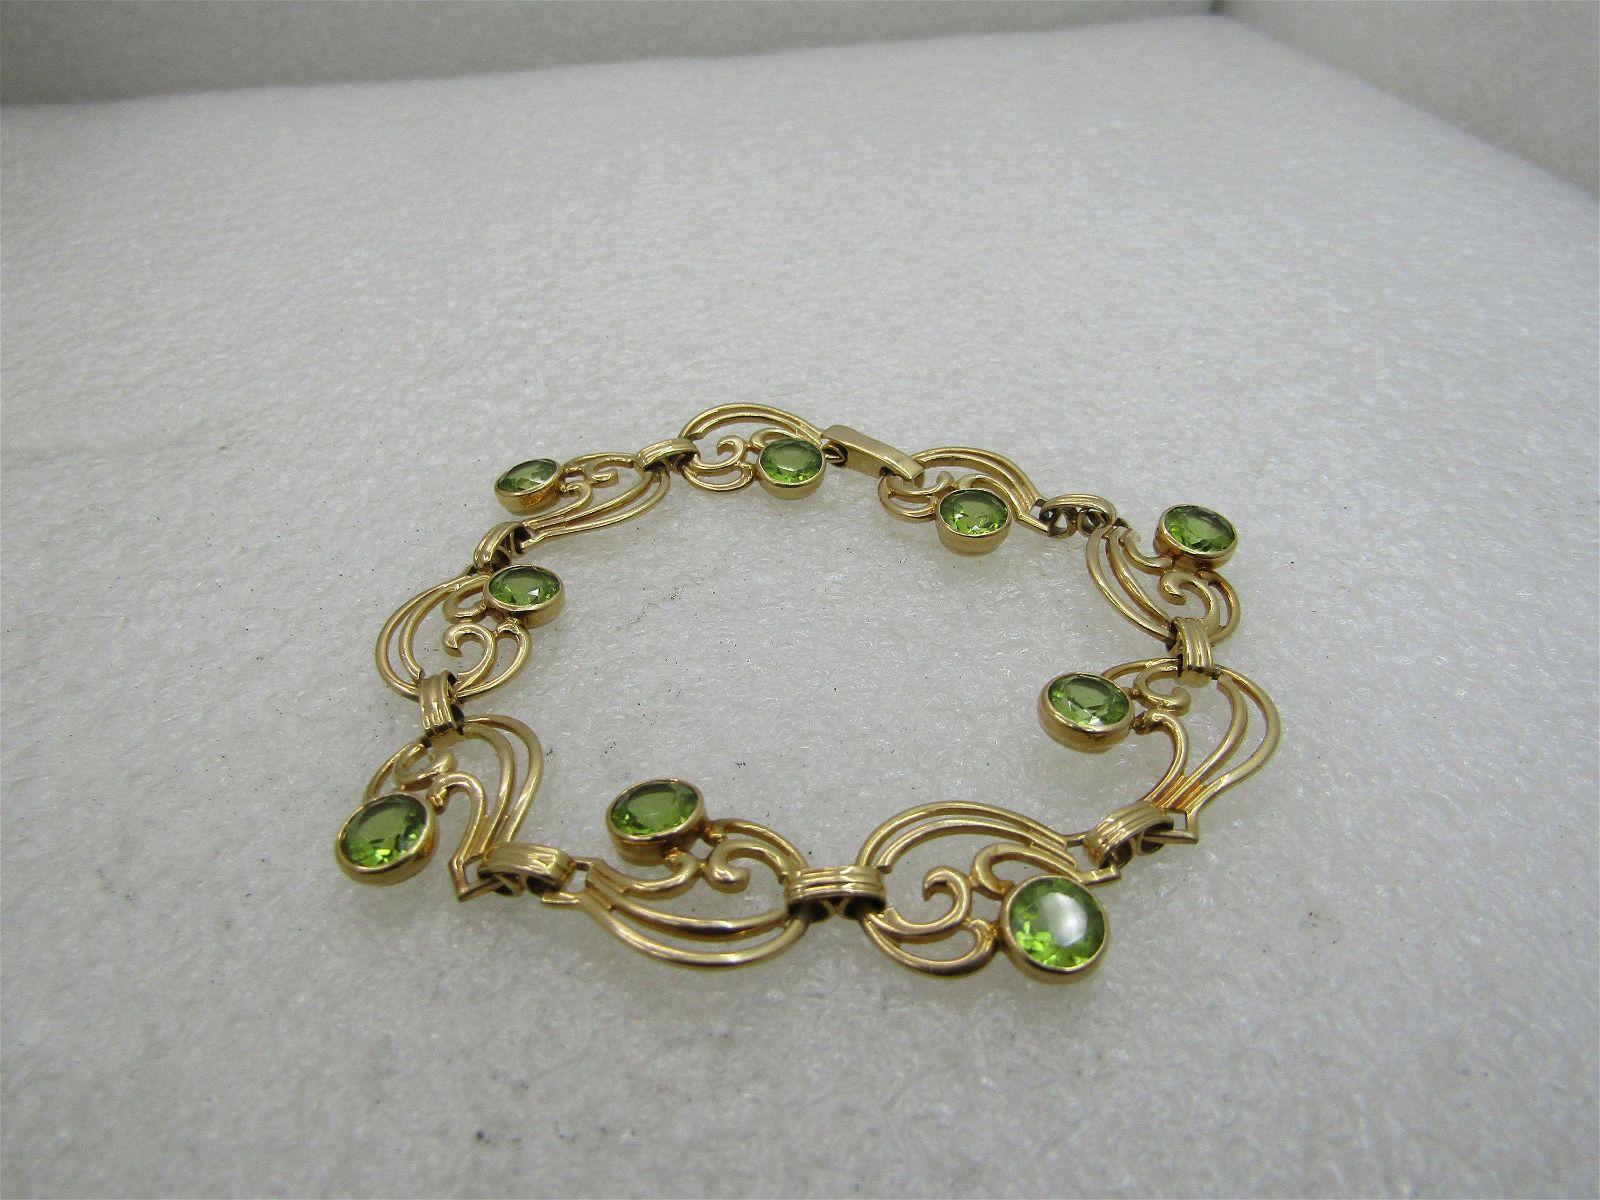 "Vintage 14kt Peridot Scrolled Bracelet 7.25"", 15.03 gr."